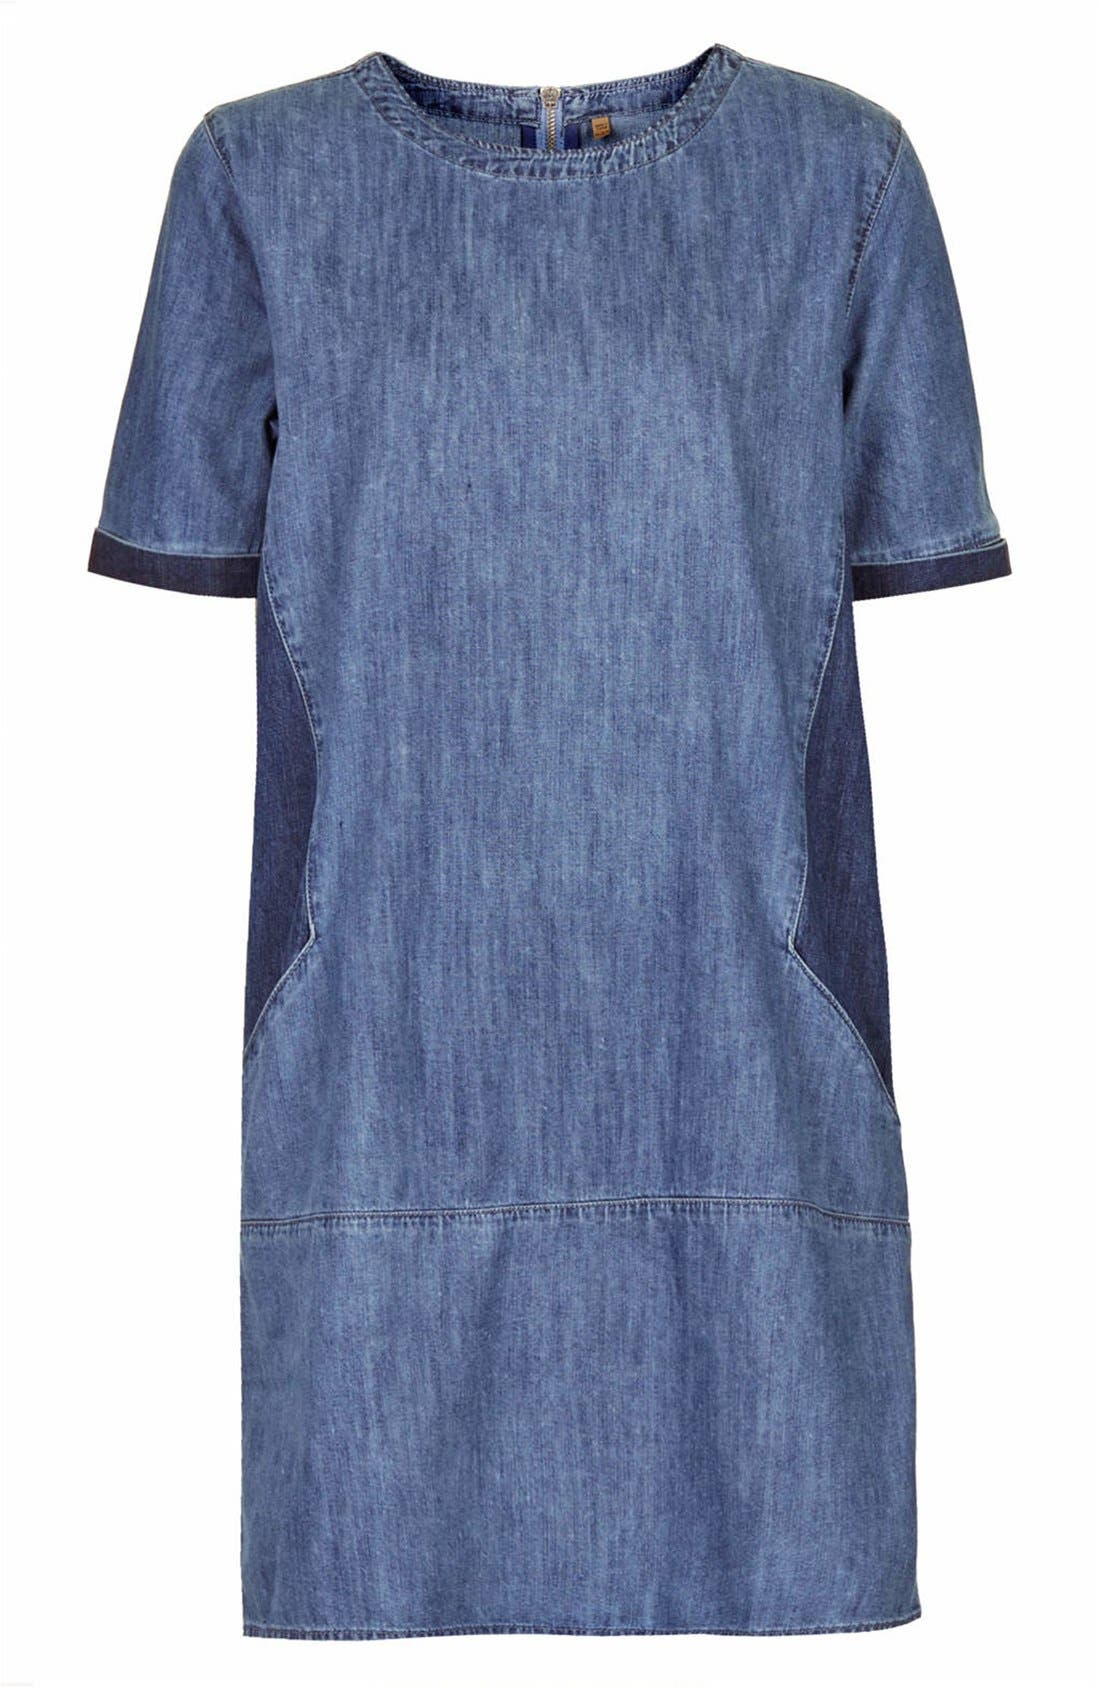 Alternate Image 3  - Topshop Moto Colorblock Denim T-Shirt Dress